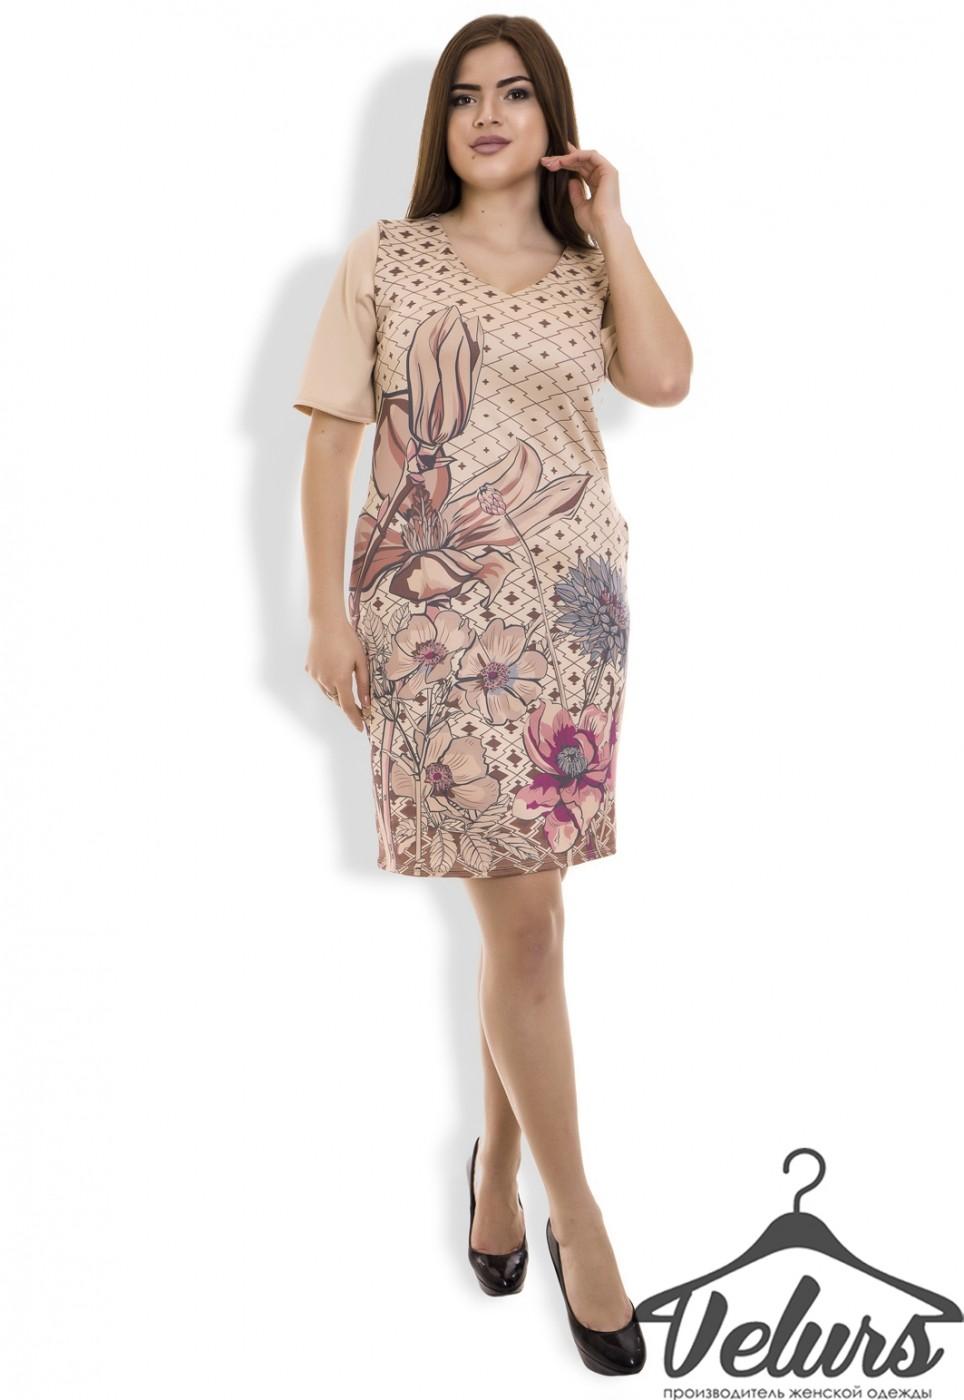 Velurs: Платье 212110 - фото 4